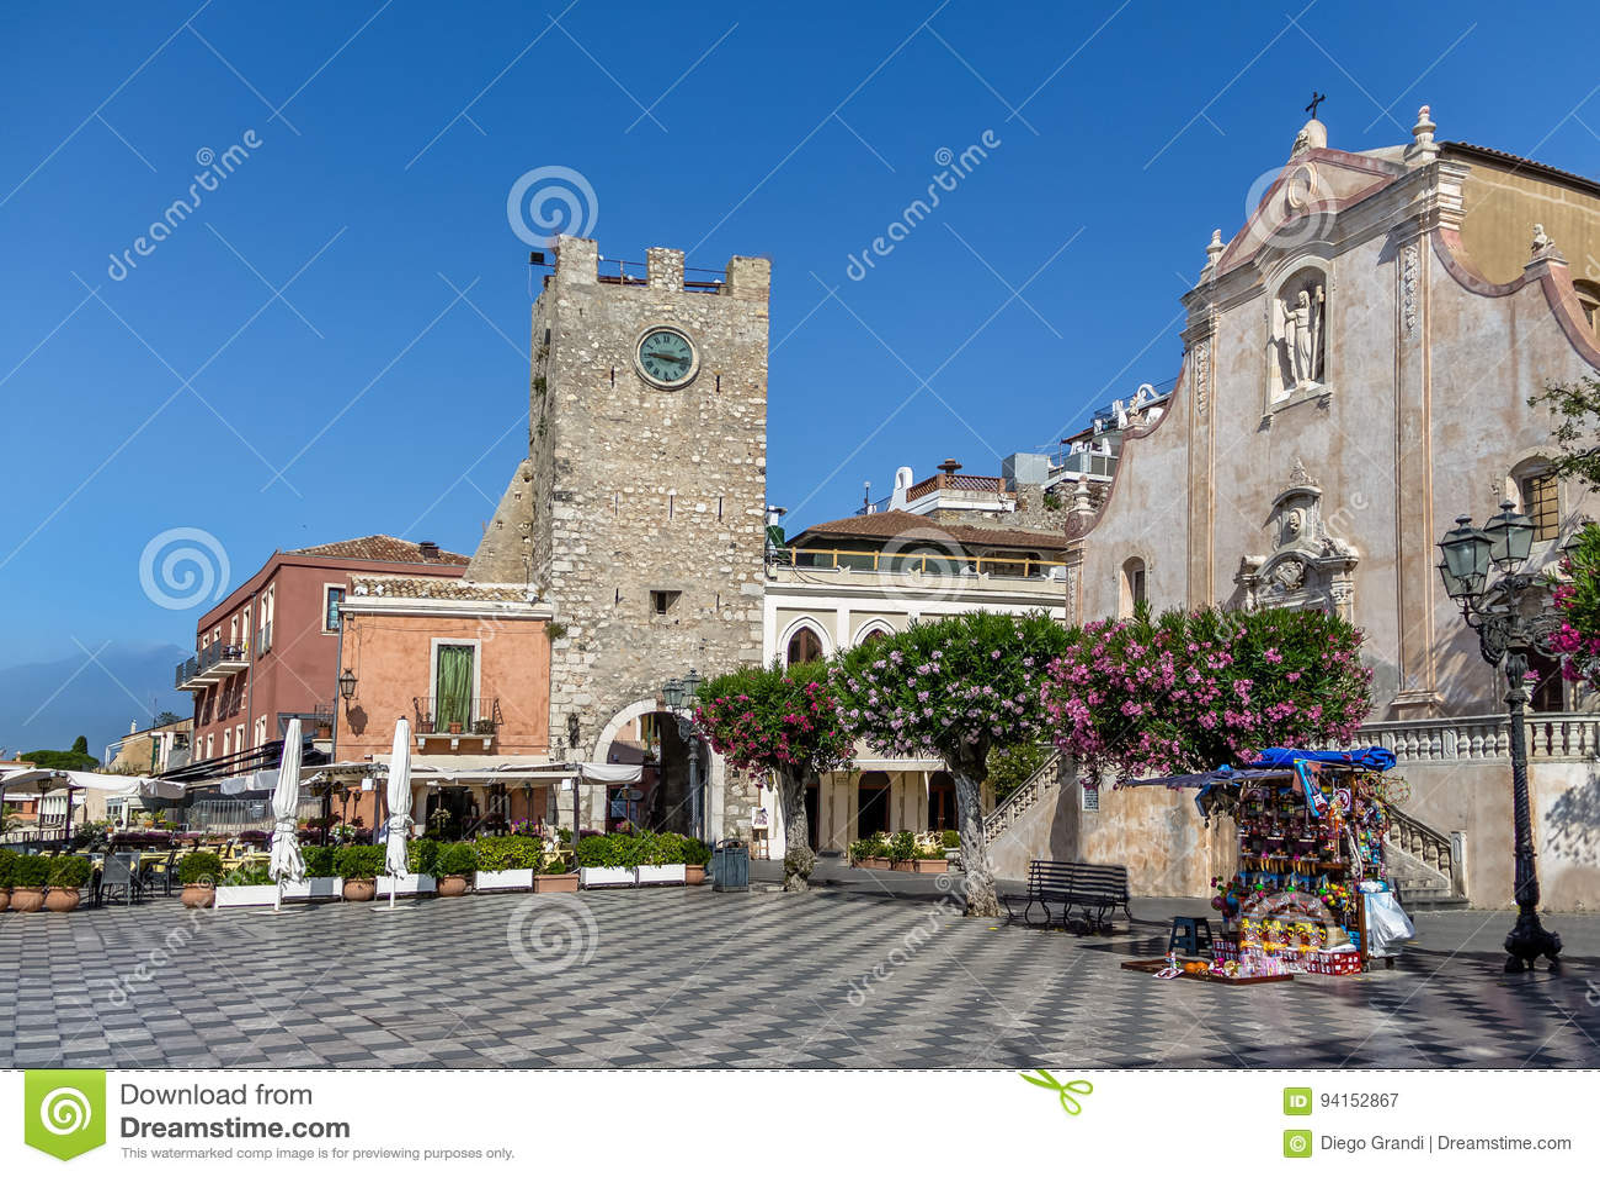 Taormina main square with San Giuseppe Church and the Clock Tower - Taormina, Sicily, Italy